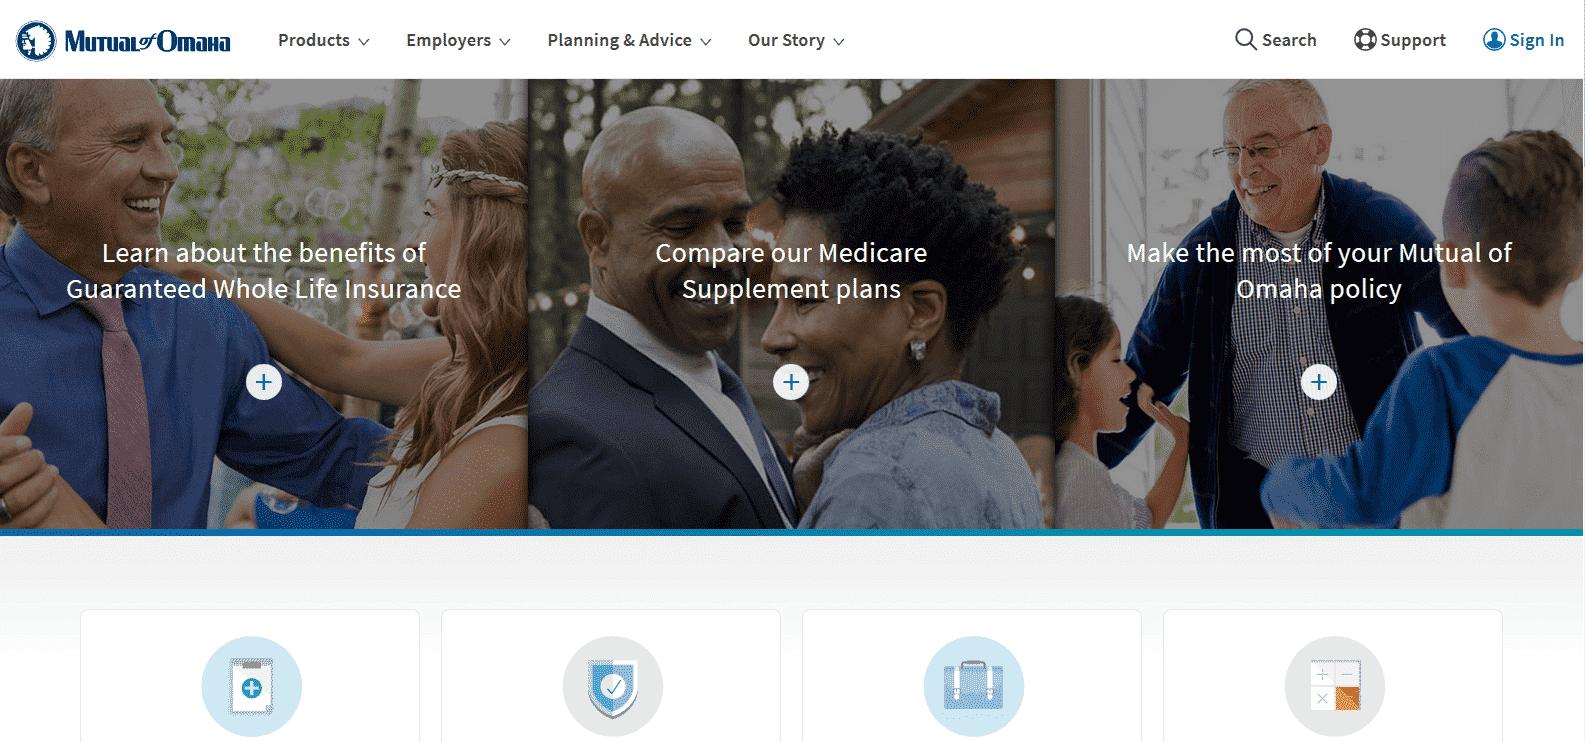 mutual of omaha homepage